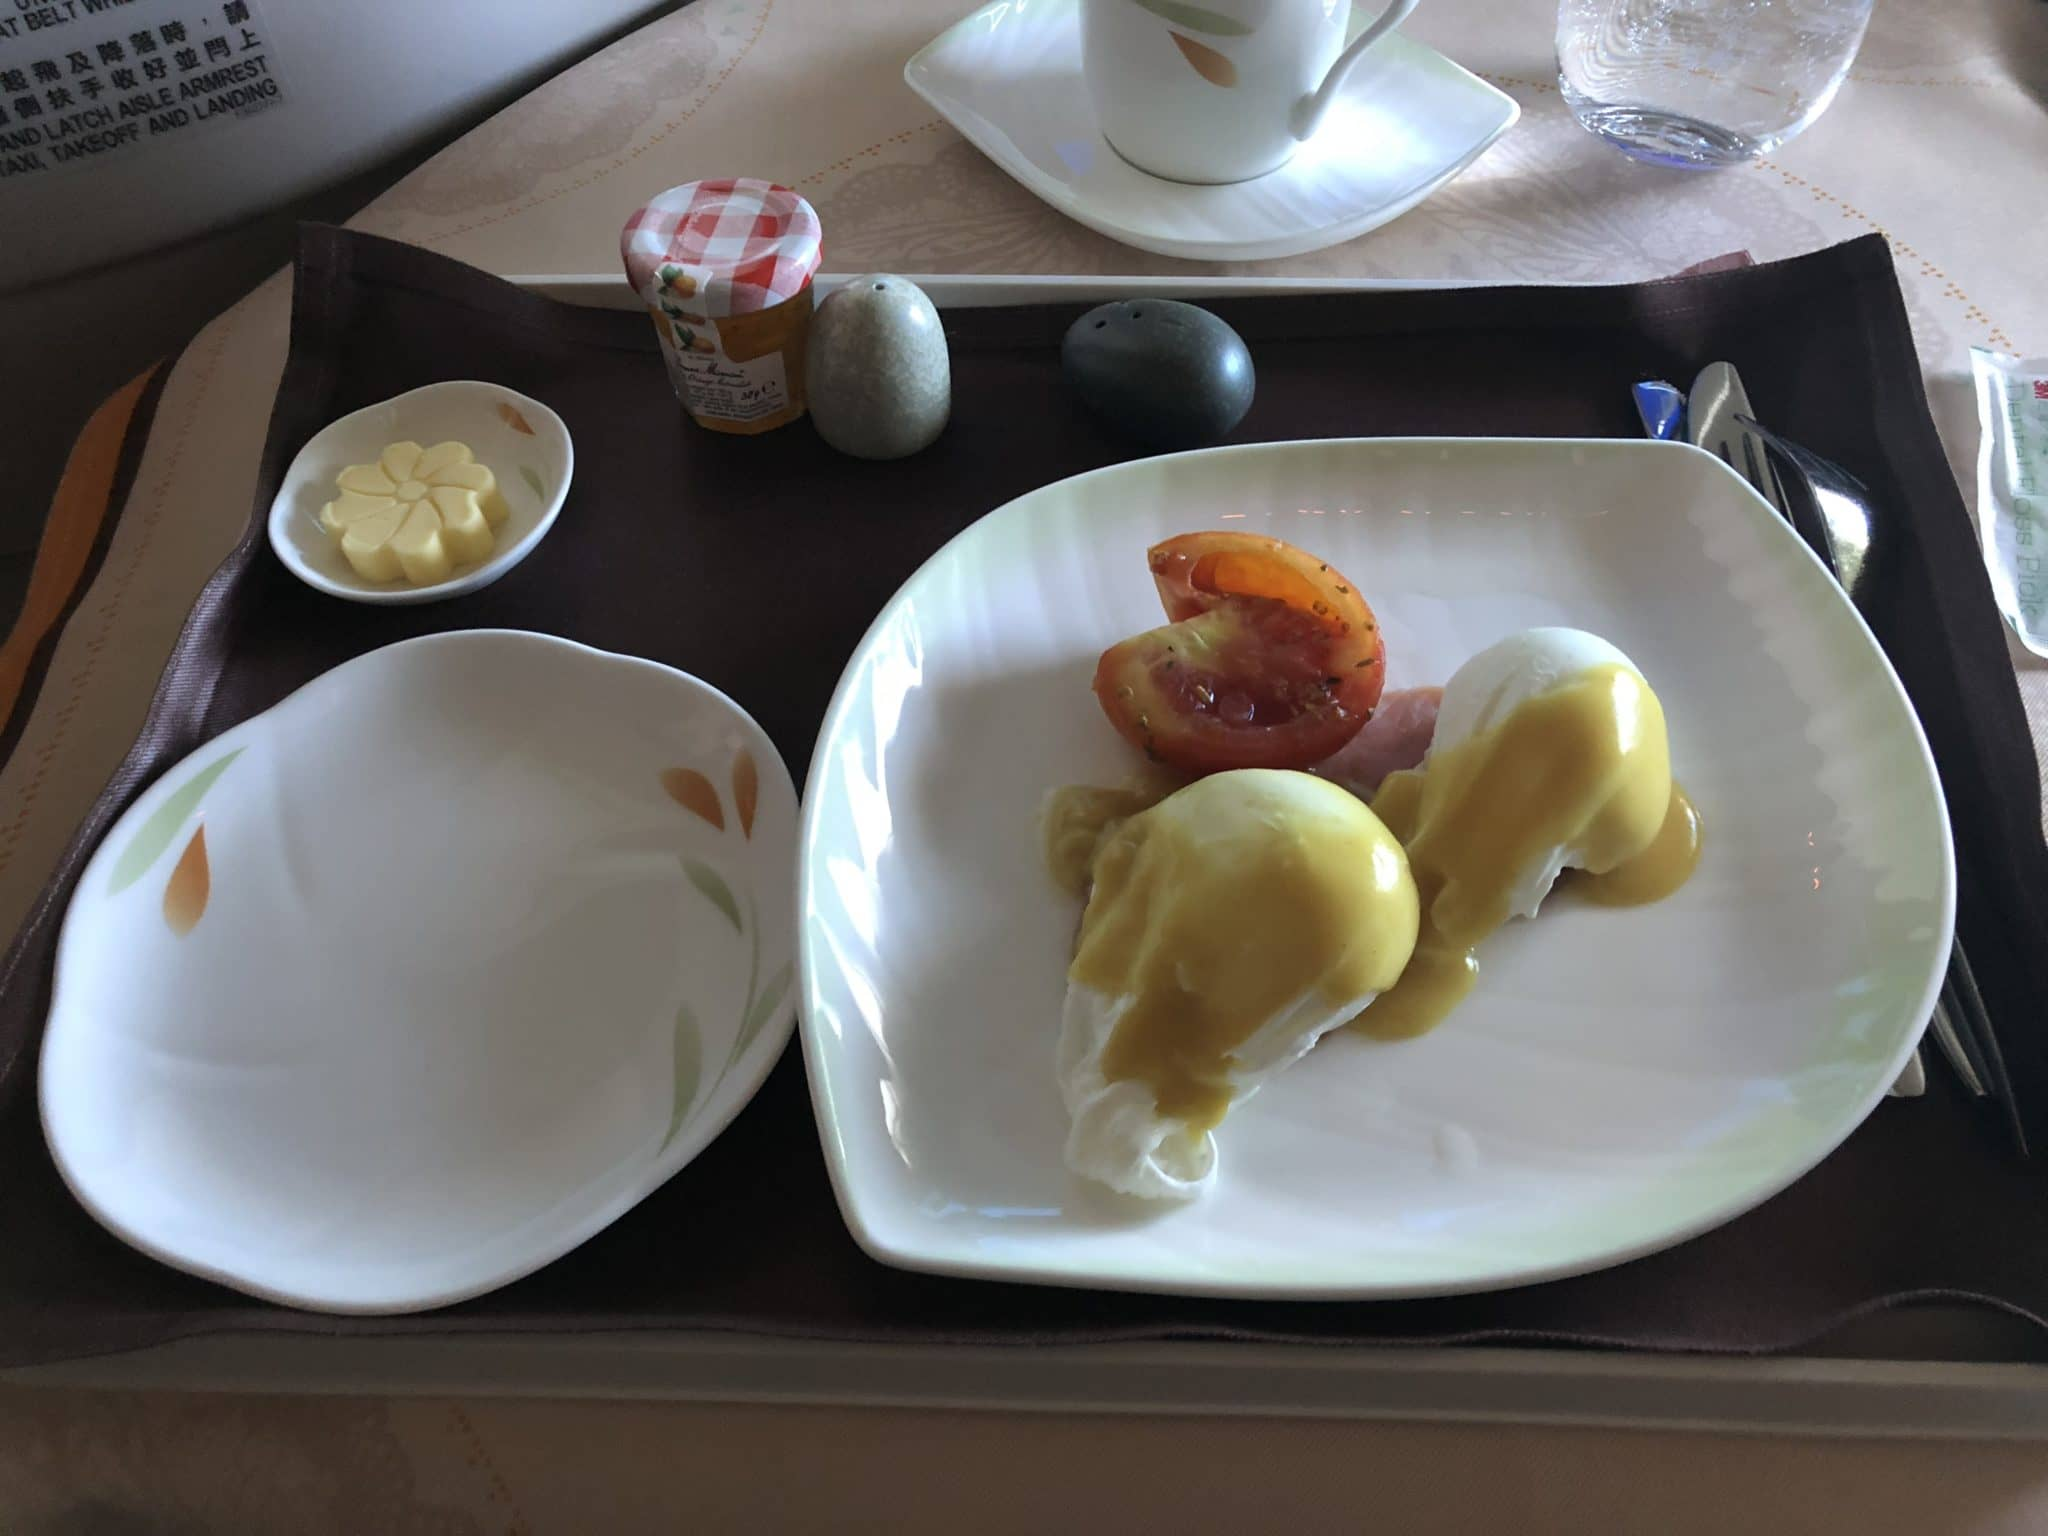 EVA Air Business Class Boeing 777-300 Poached Eggs